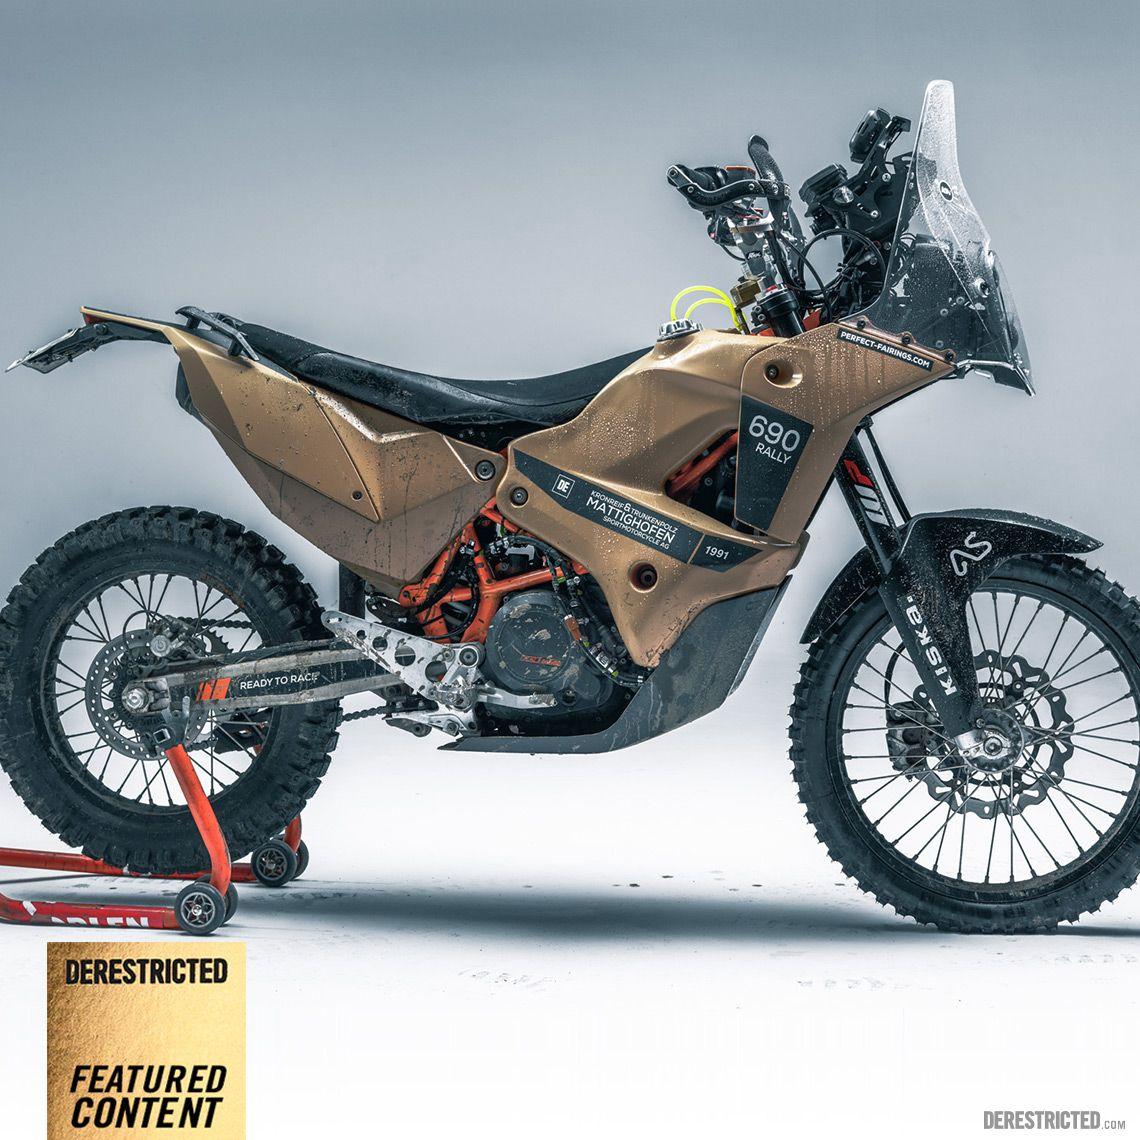 Supermoto ktm 690 stunt concept bikemotorcycletuned car tuning car - Best 25 Ktm 690 Ideas On Pinterest Dirt Bike Toys Ktm Motor And Ktm Atv